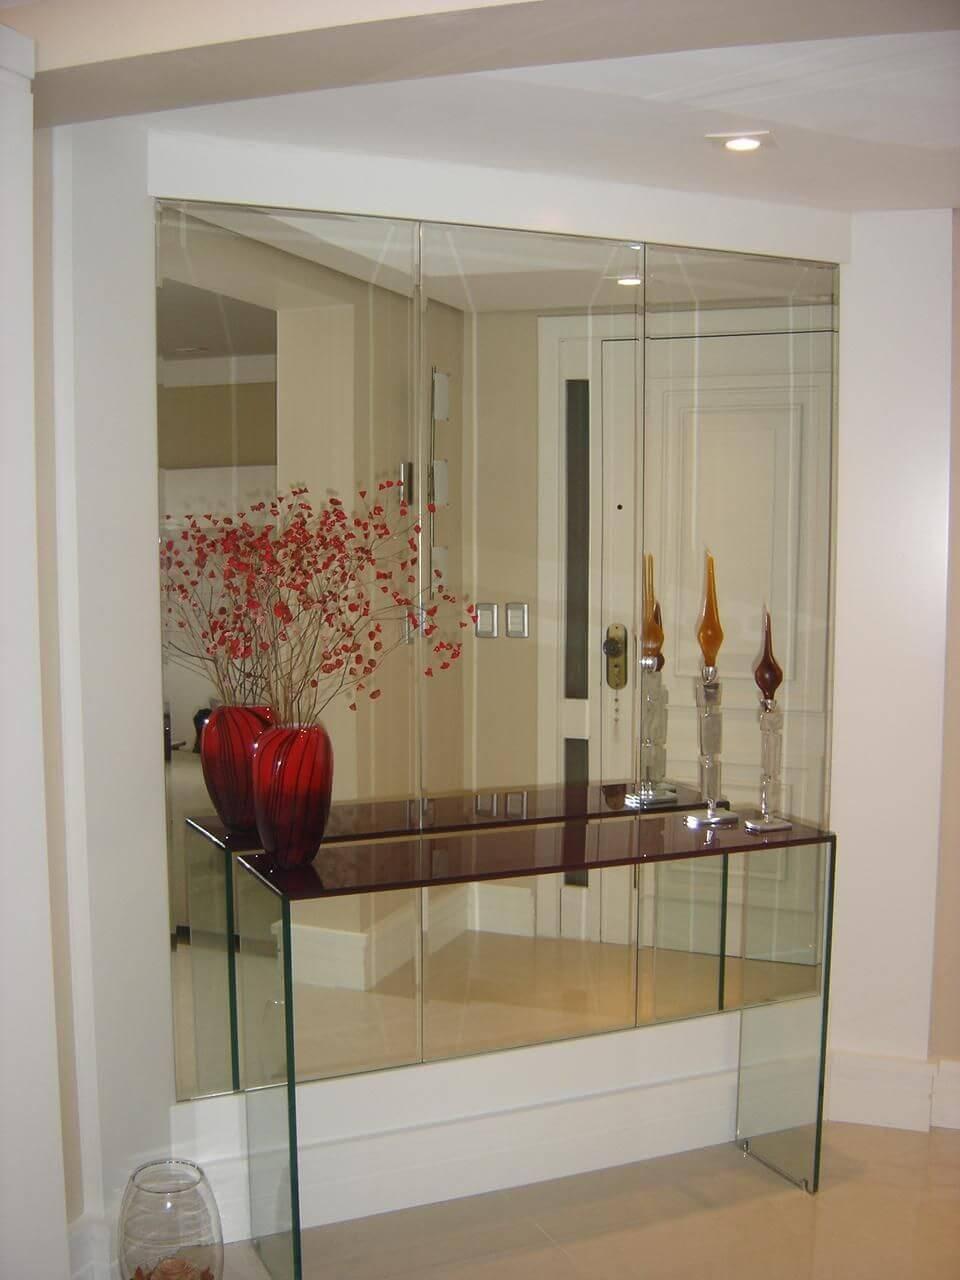 aparador de vidro - aparador de vidro pintado